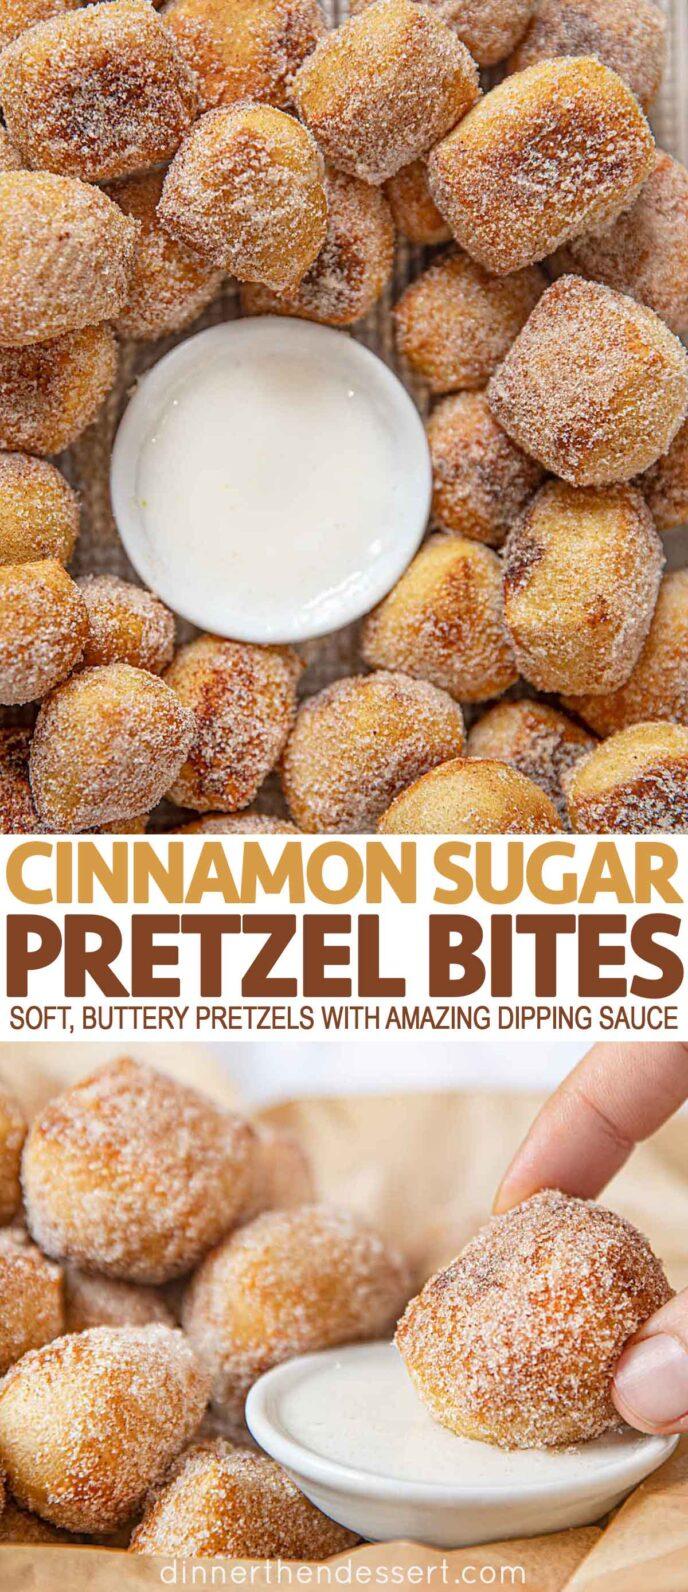 Pretzel Bites with Cinnamon Sugar